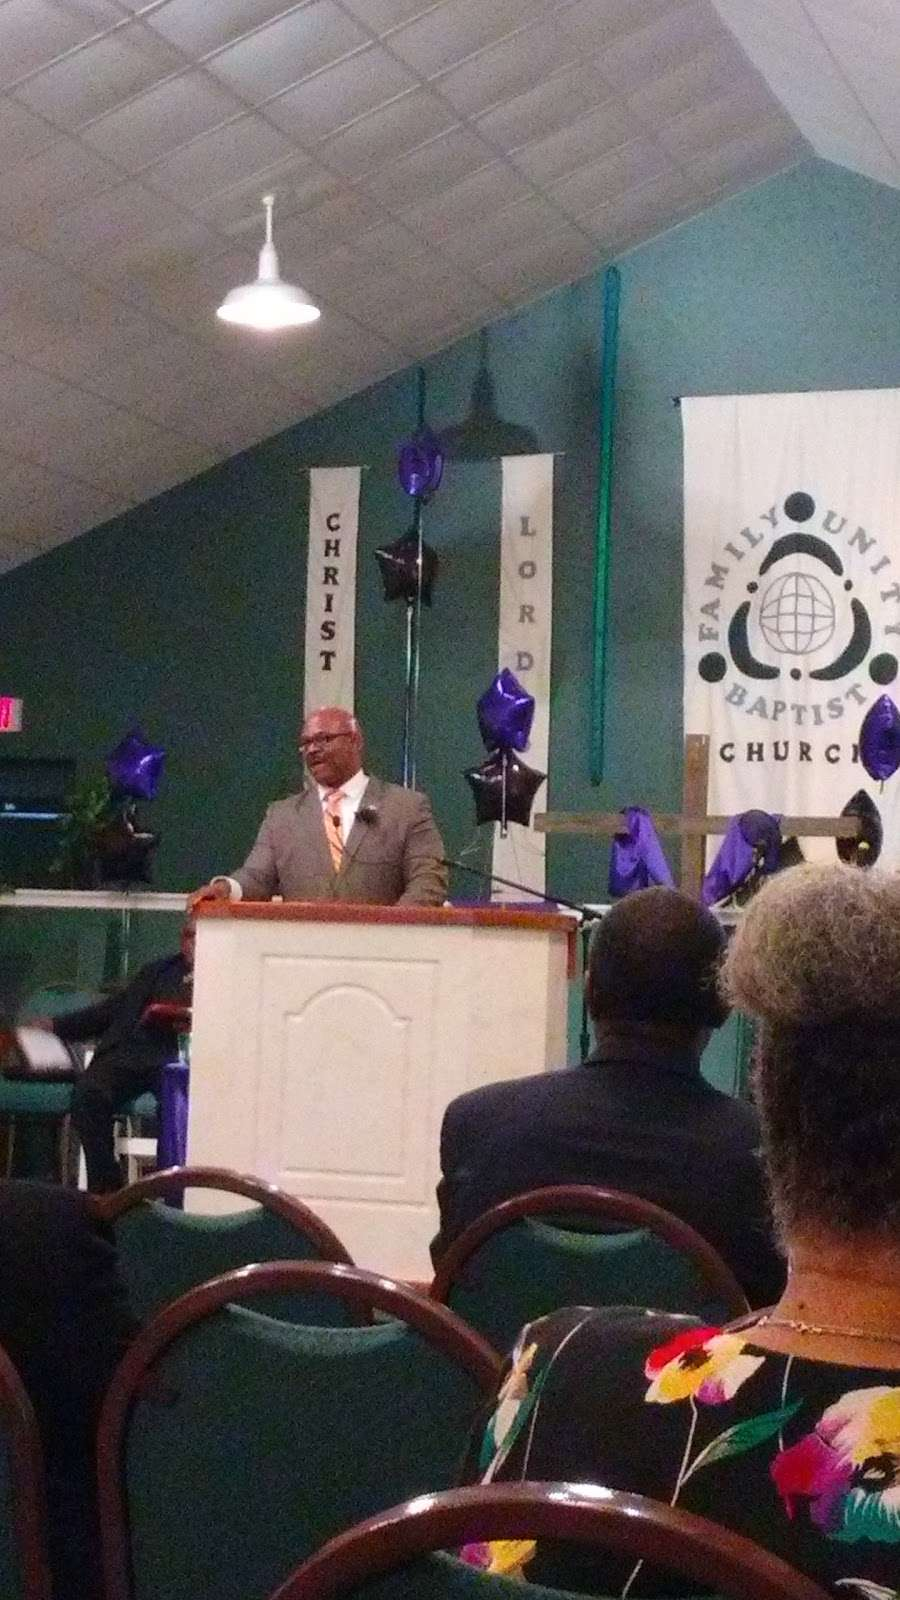 Family Unity Baptist Church - church    Photo 3 of 5   Address: 1221 Cedar Dr, La Marque, TX 77568, USA   Phone: (409) 933-4962